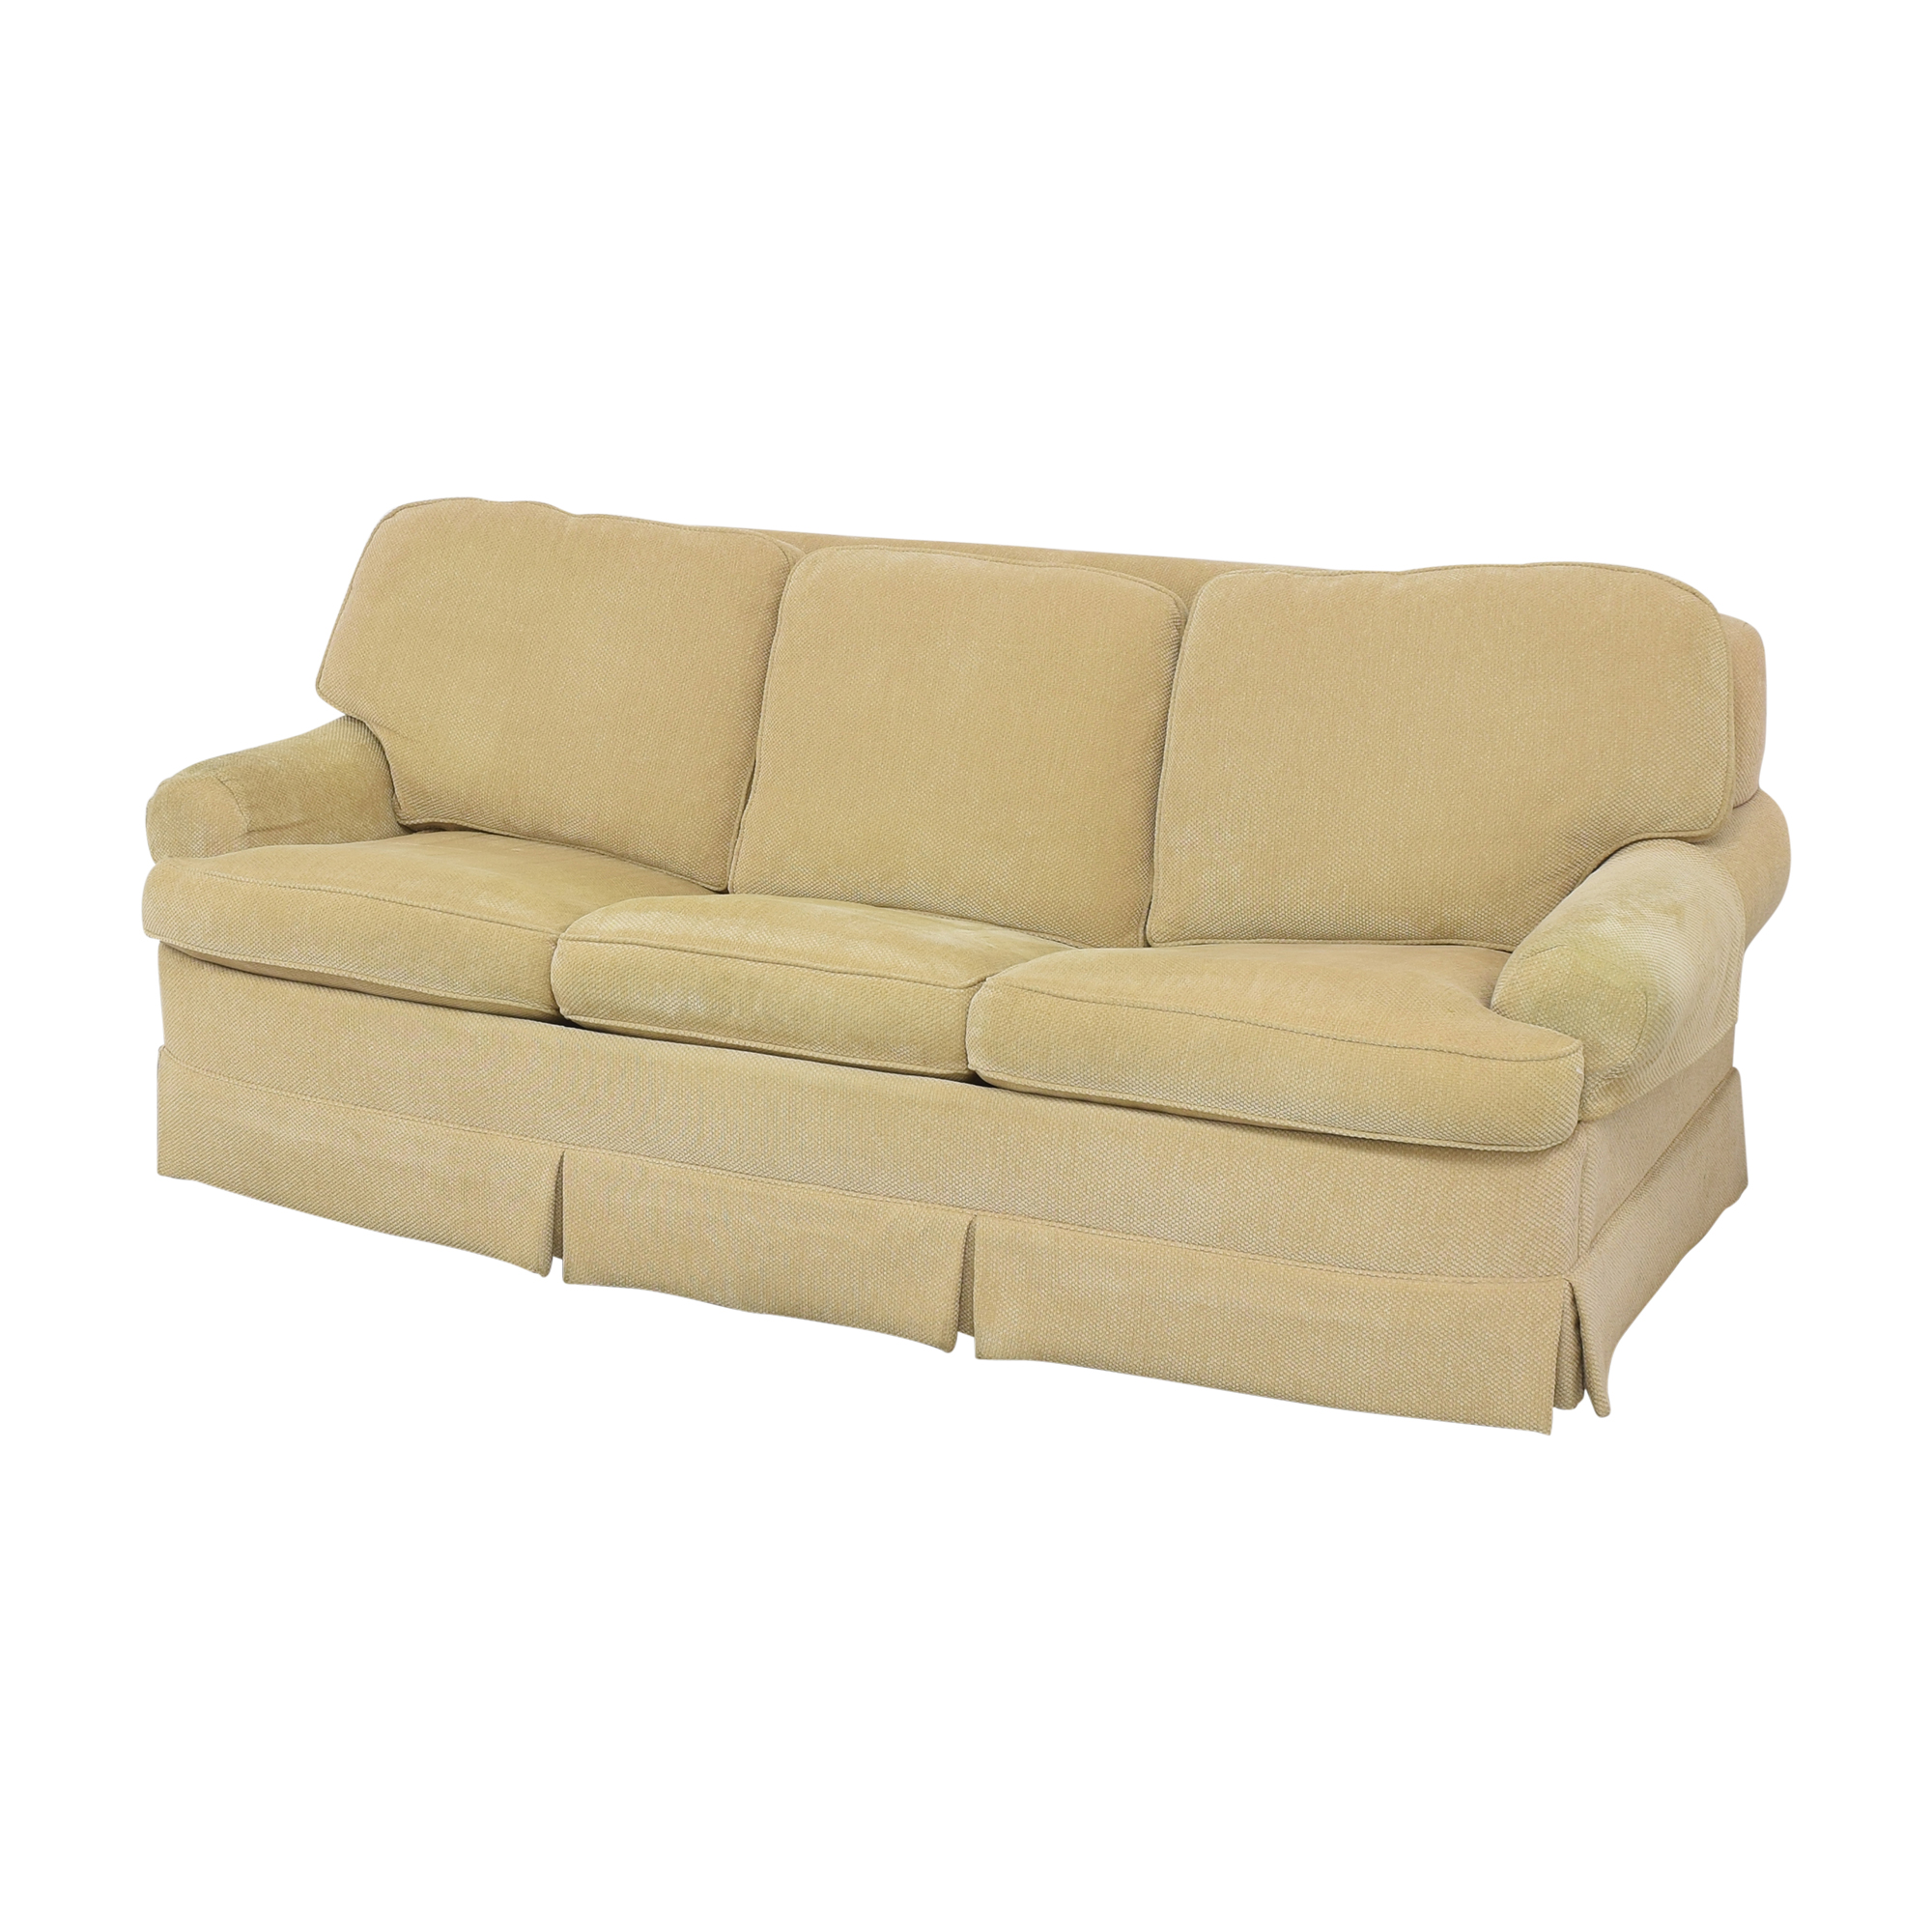 Ralph Lauren Home Ralph Lauren Roll Arm Sleeper Sofa for sale